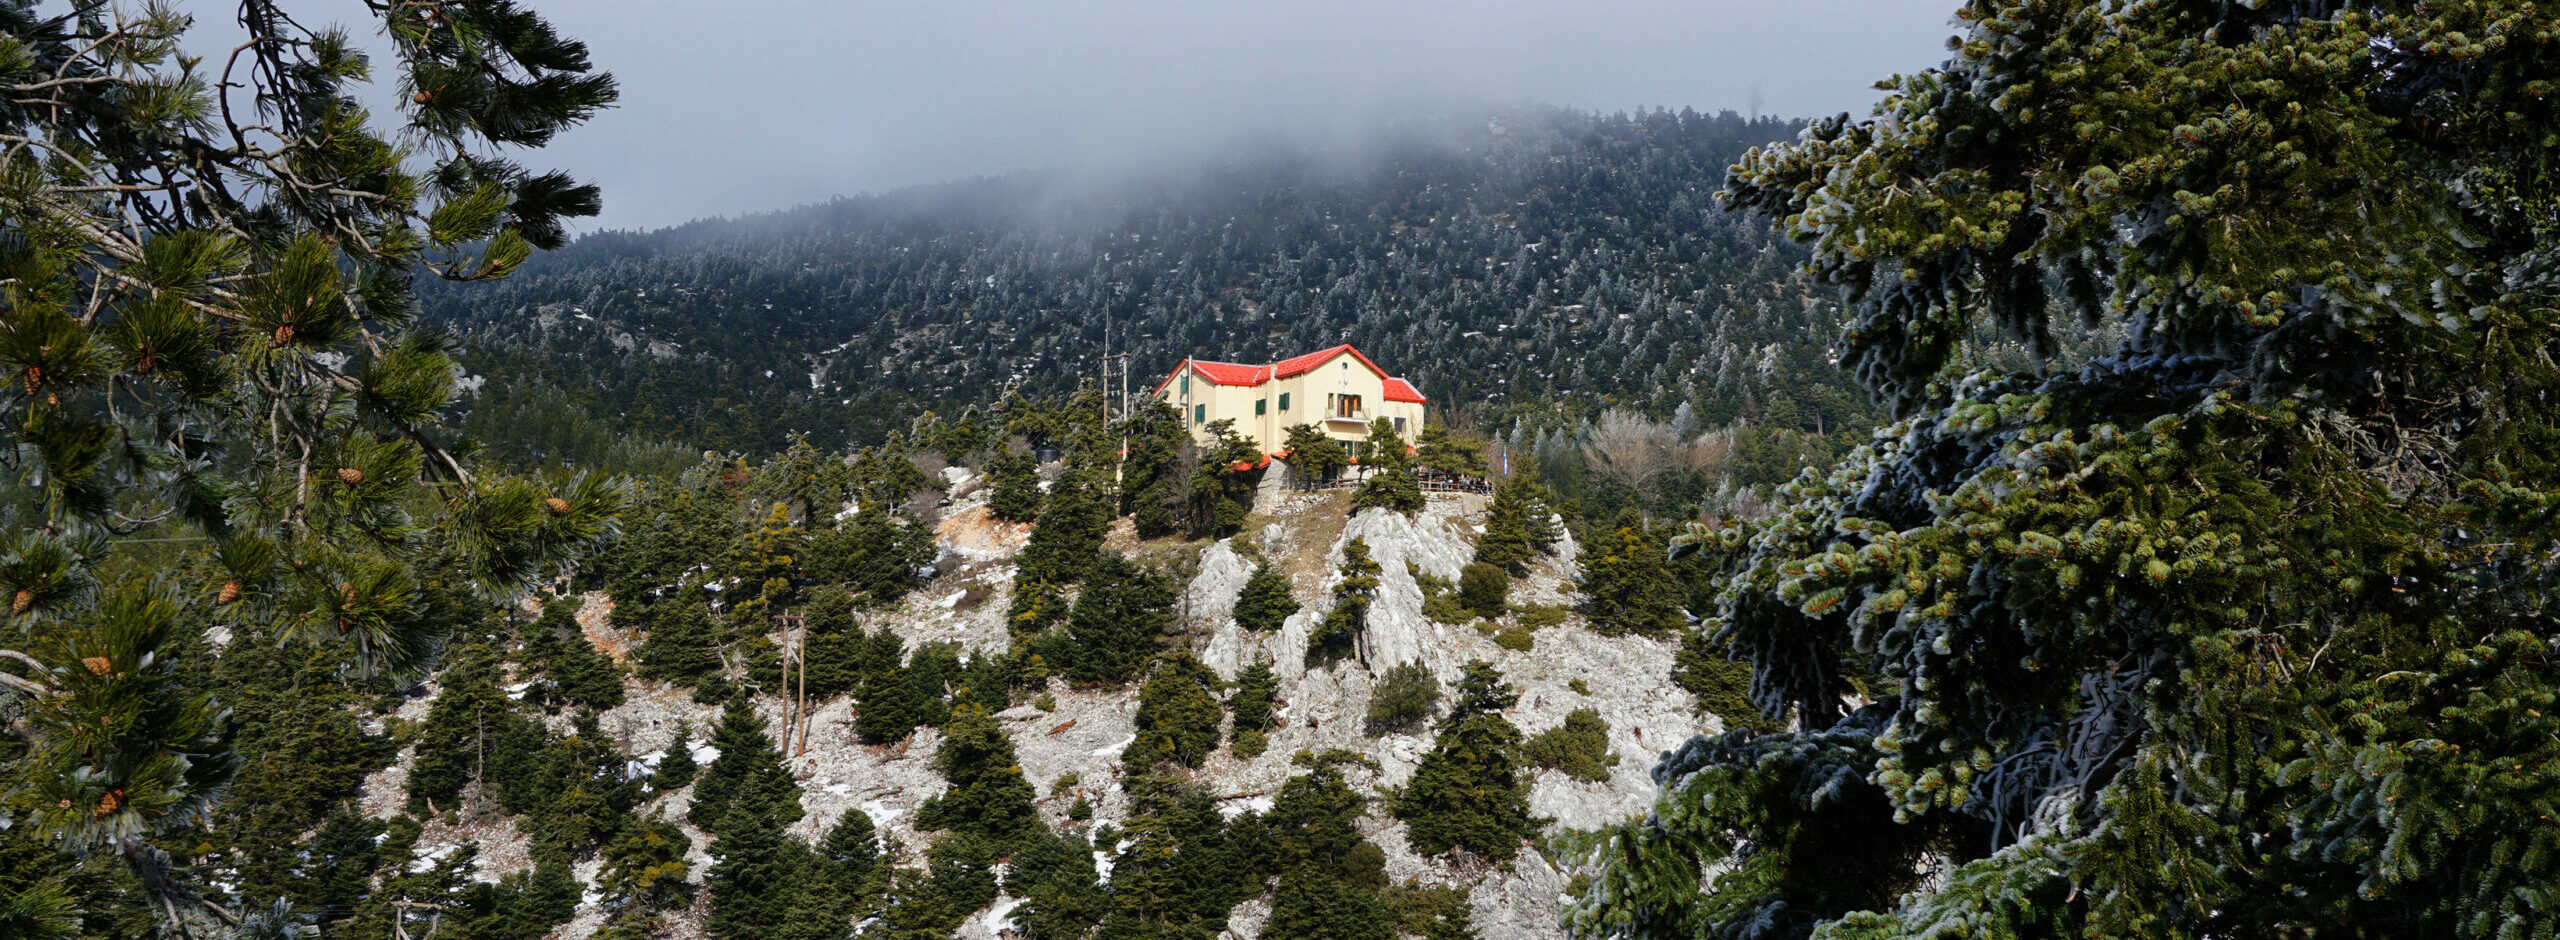 Attica: The Flambouri shelter on Mount Parnitha